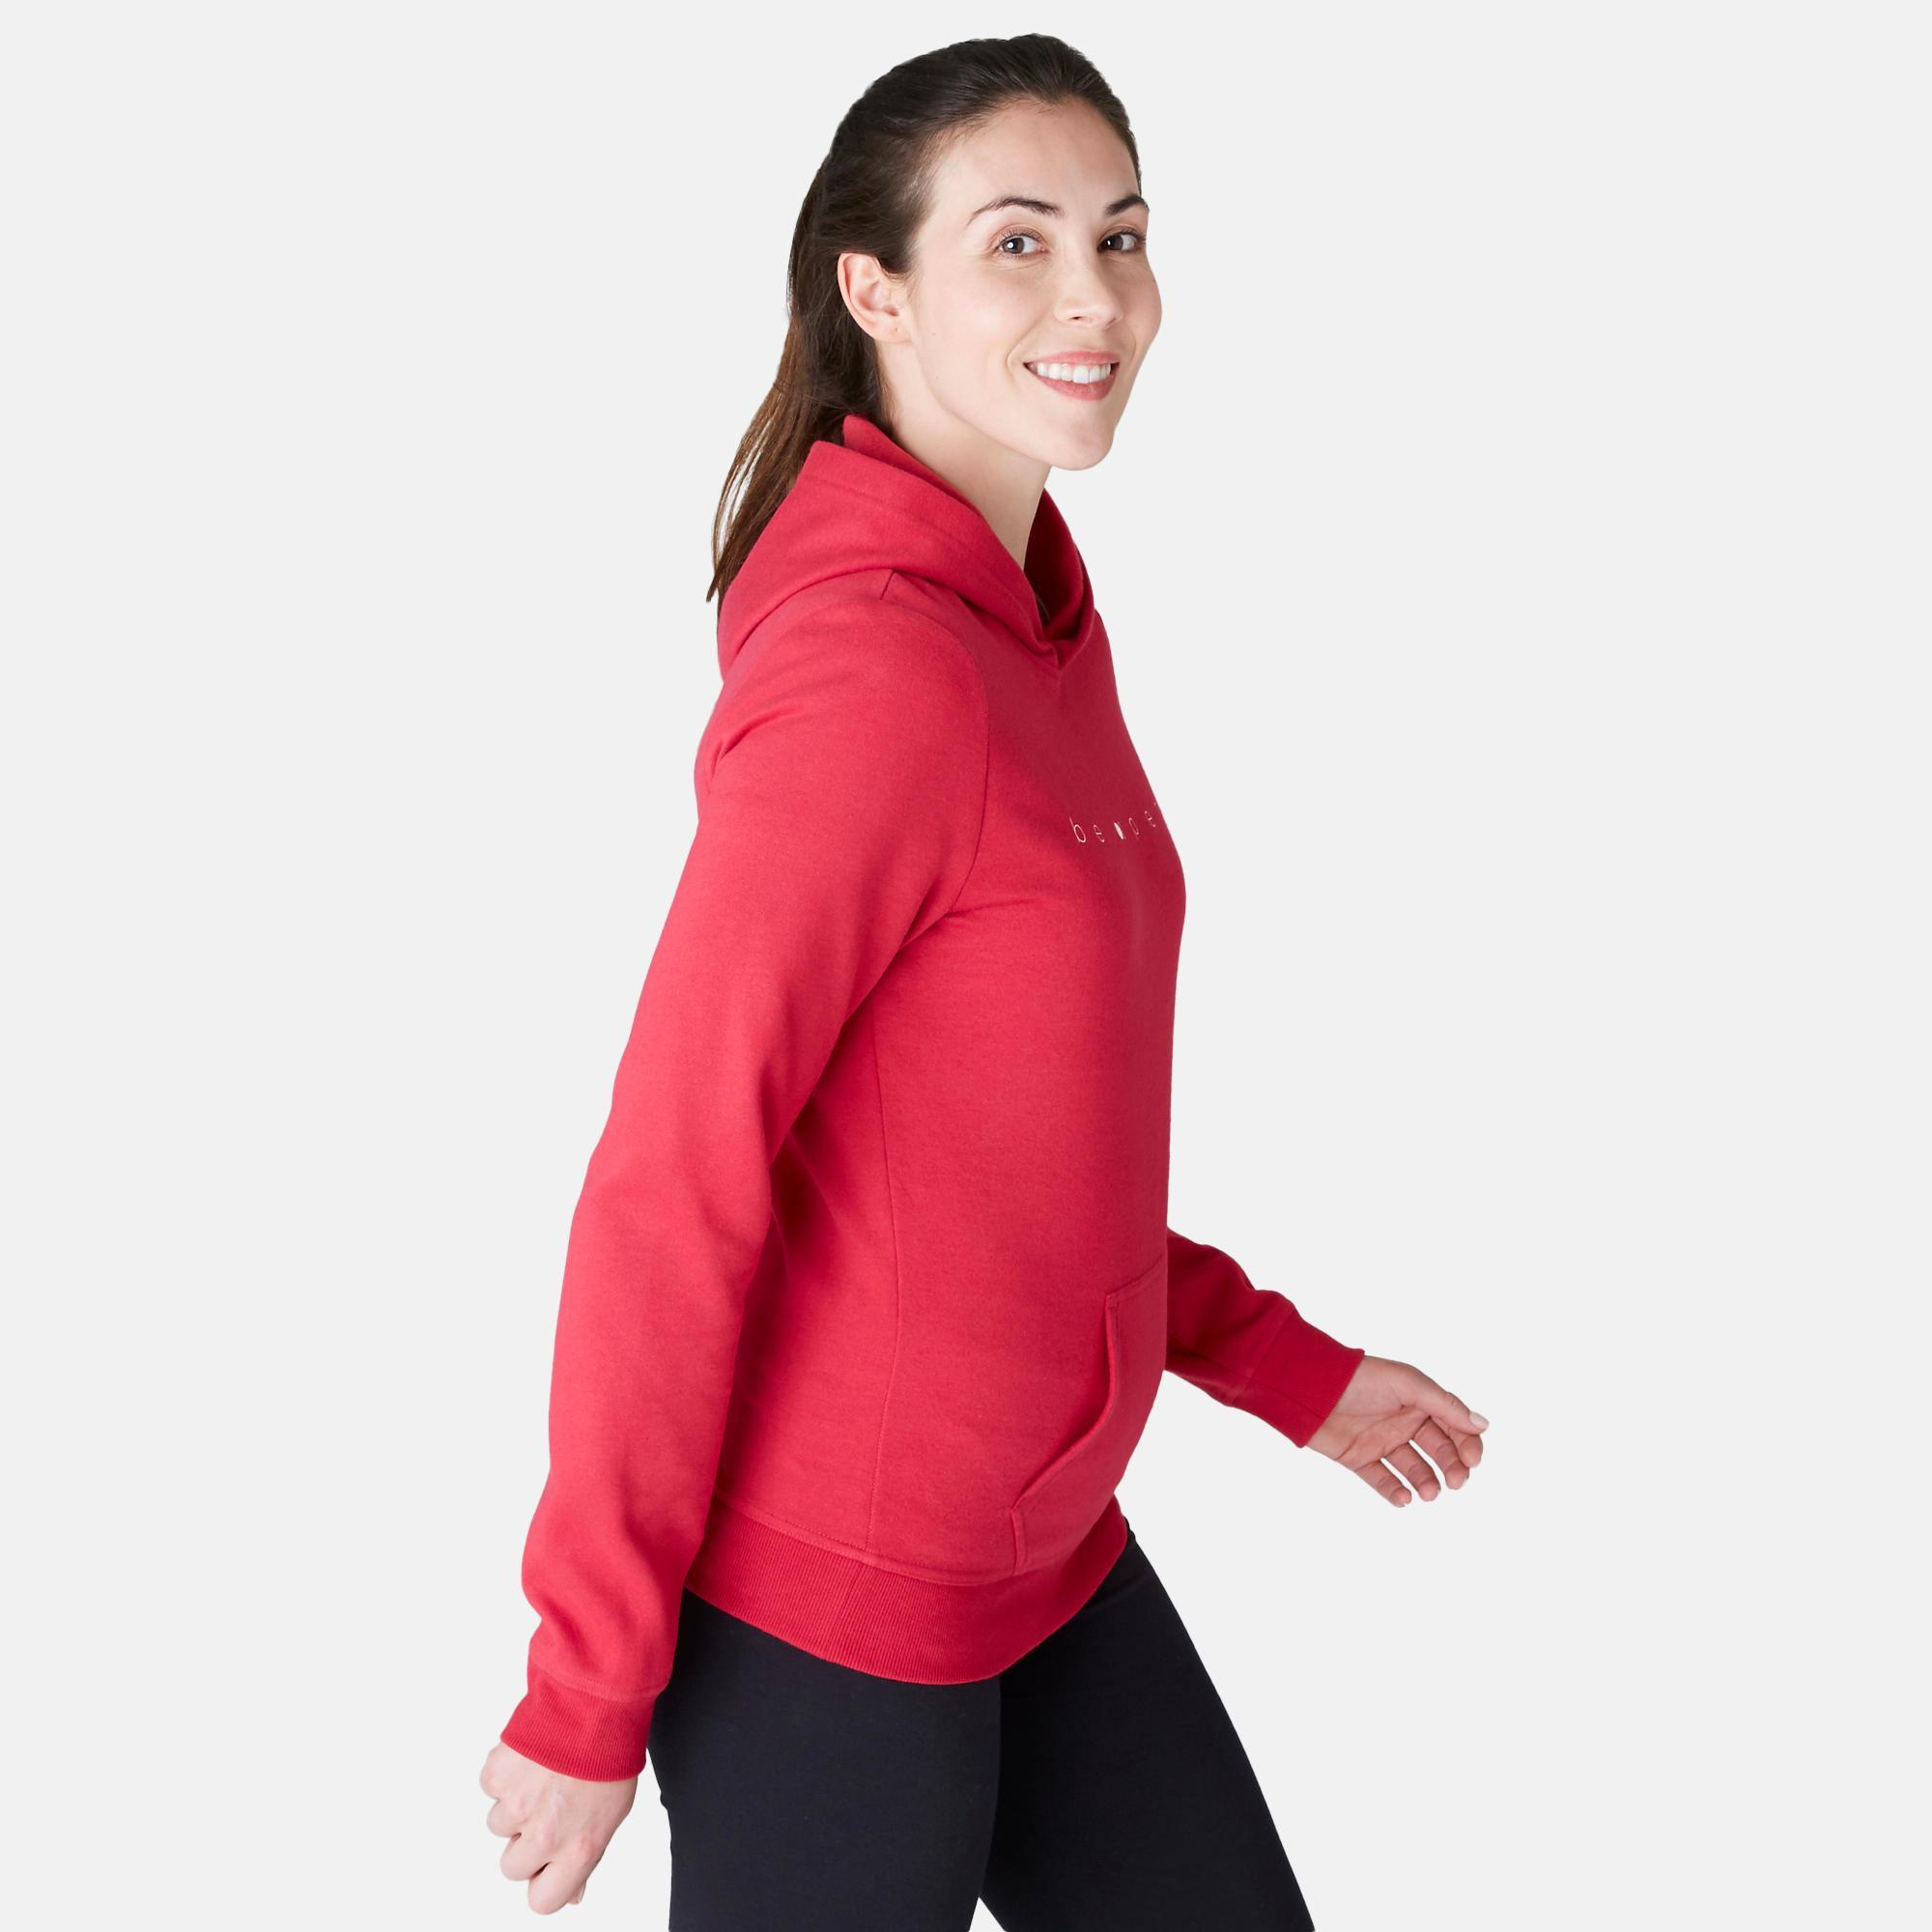 Sweat 520 capuche pilates gym douce femme rouge domyos